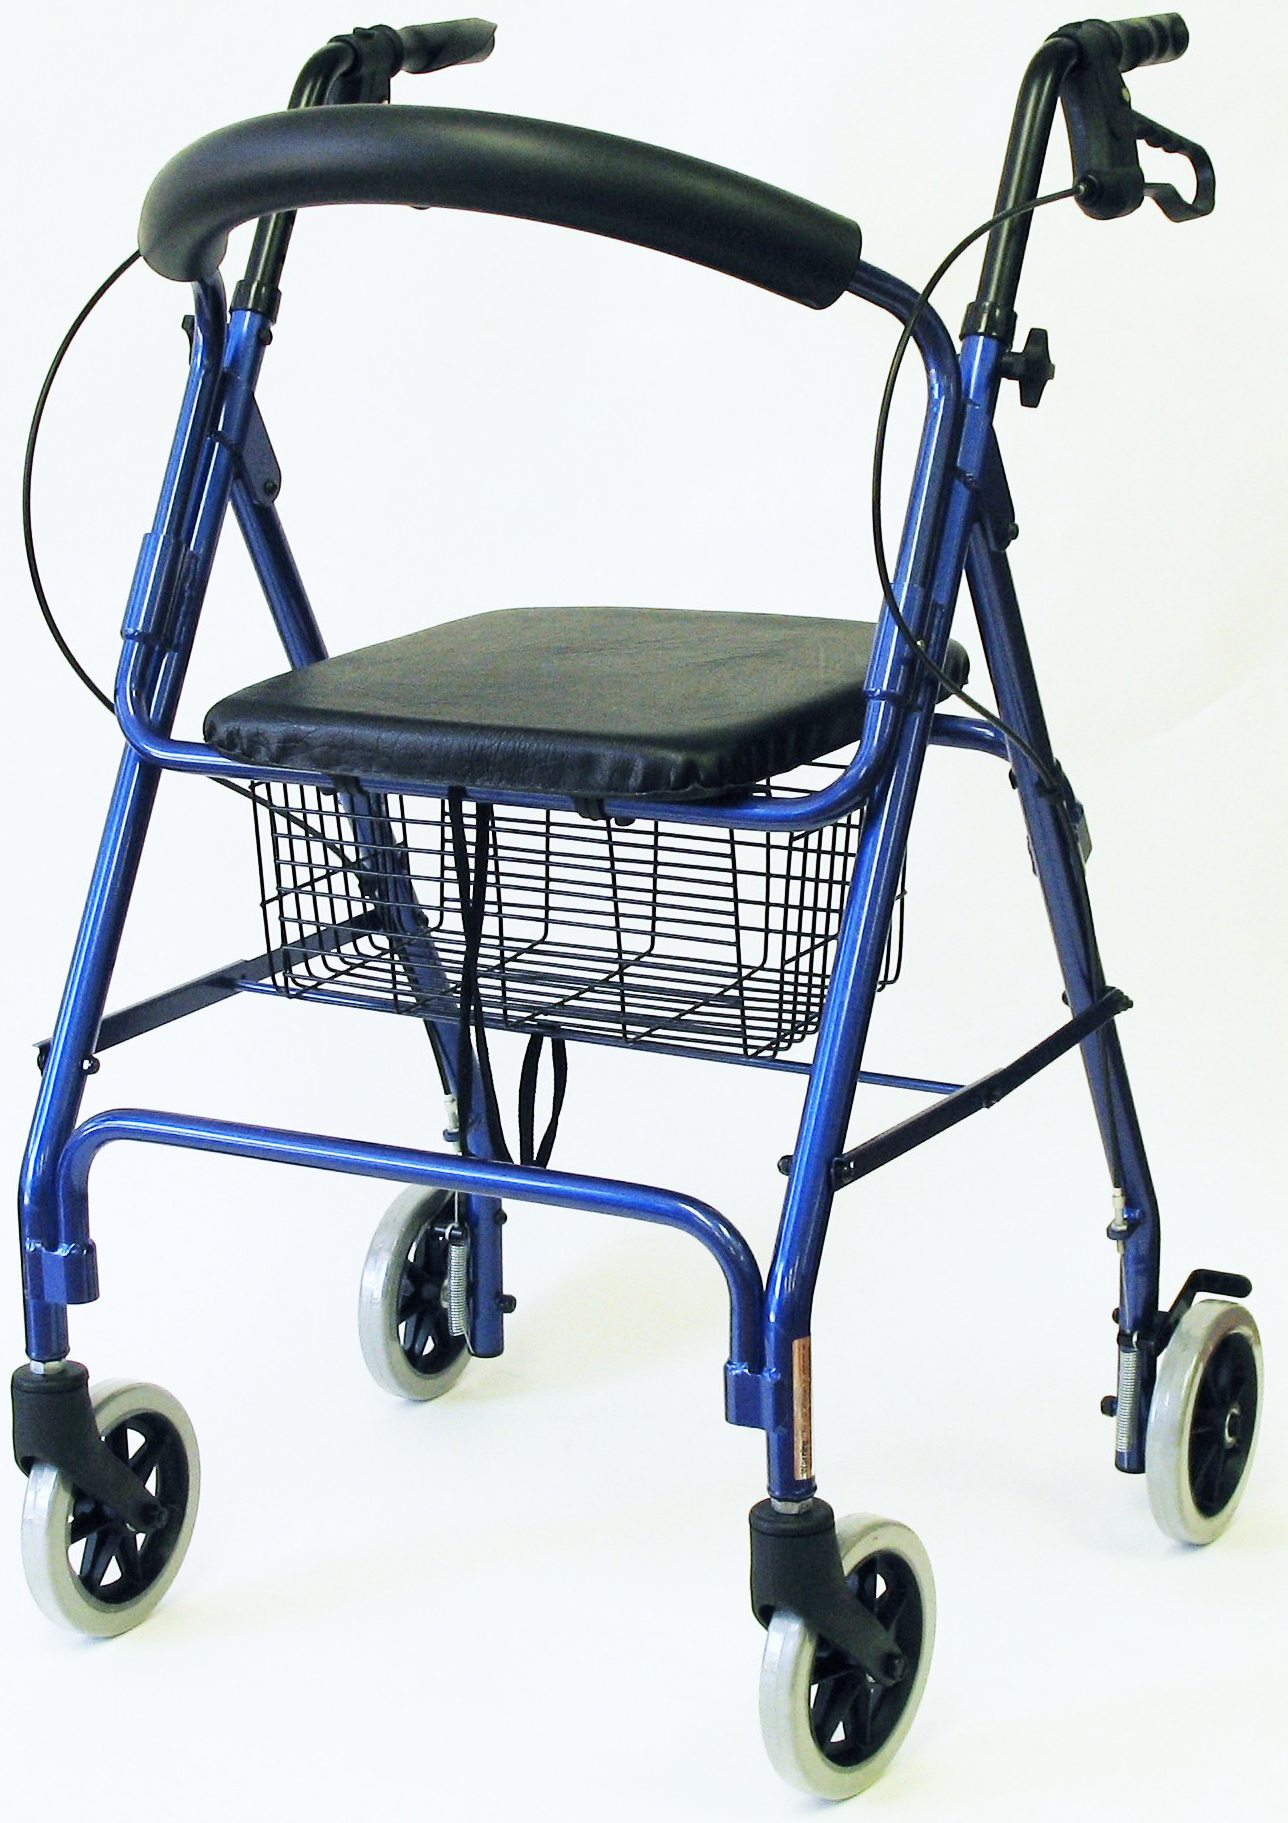 walker roller chair armless task karman 4 wheel with basket